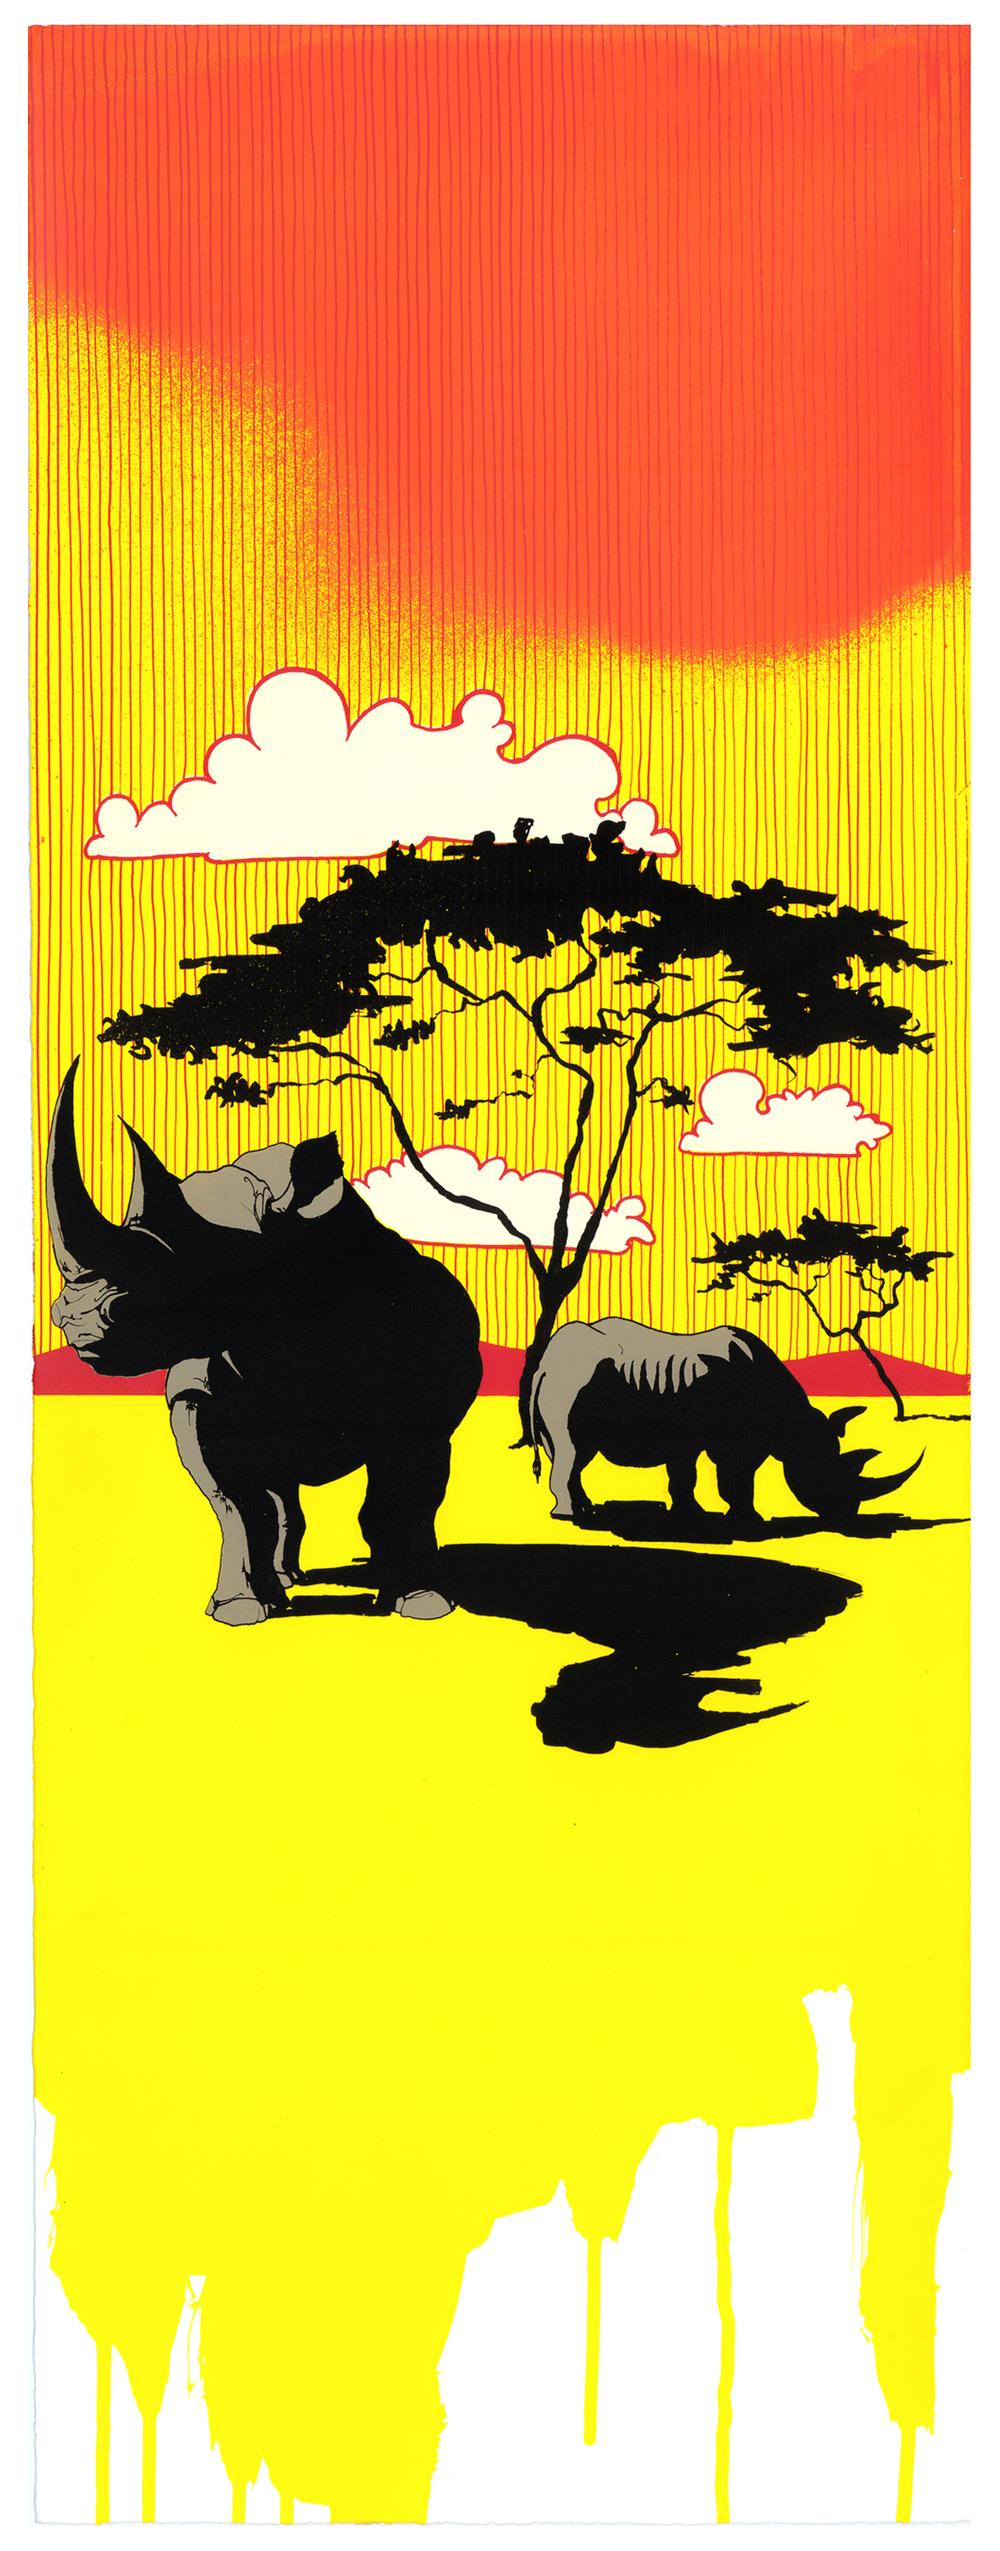 141_rhino.jpg